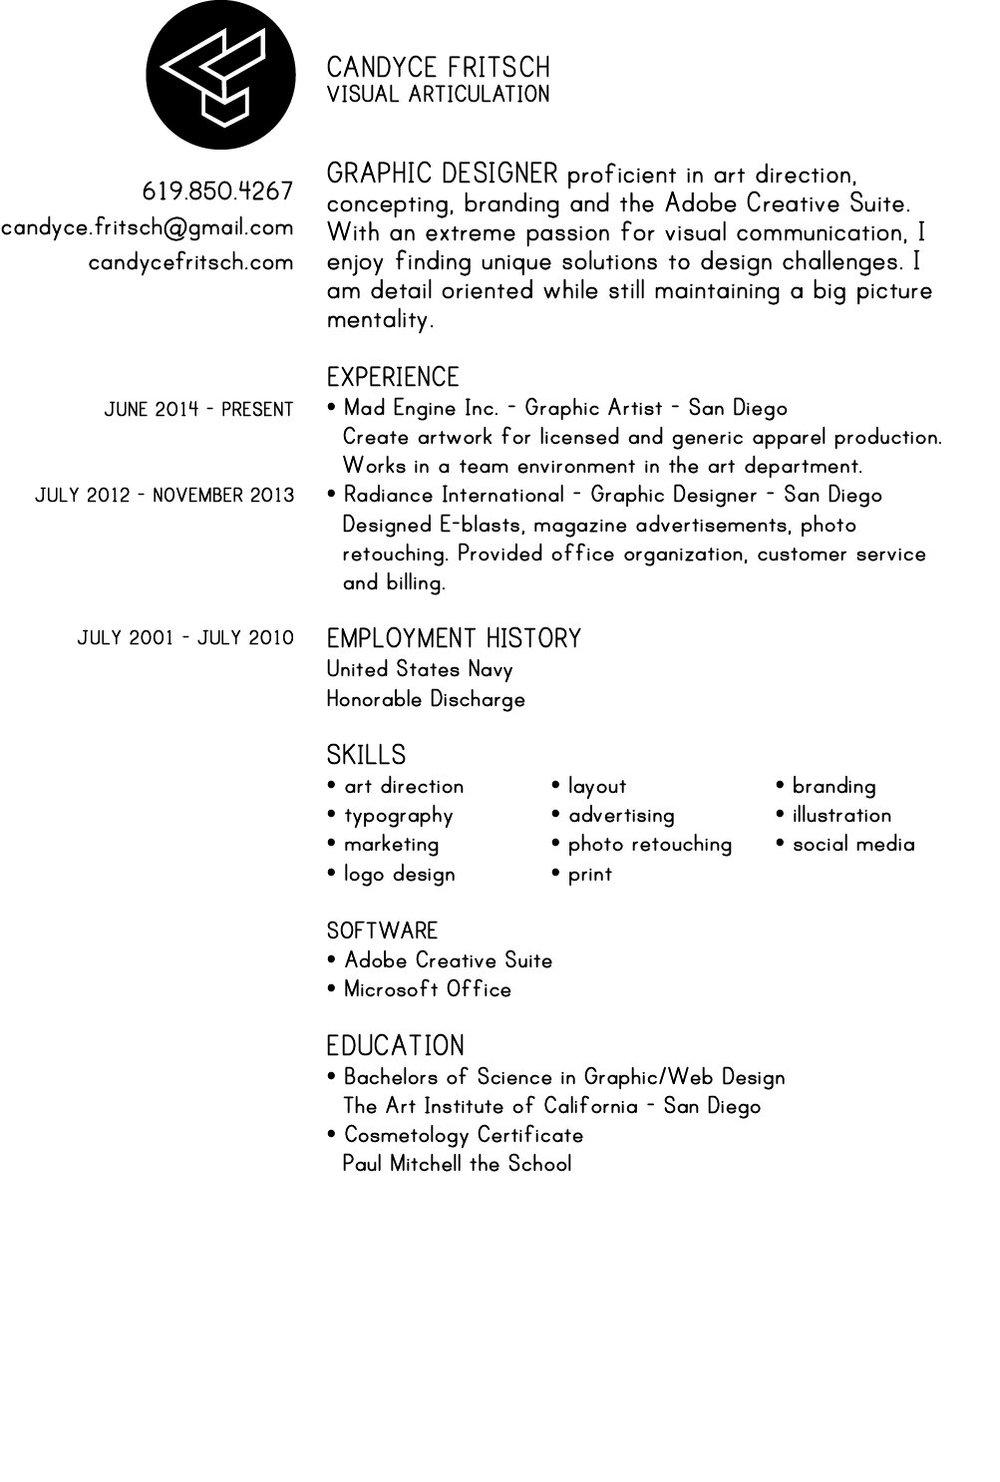 Candyce Fritsch_resume.jpg